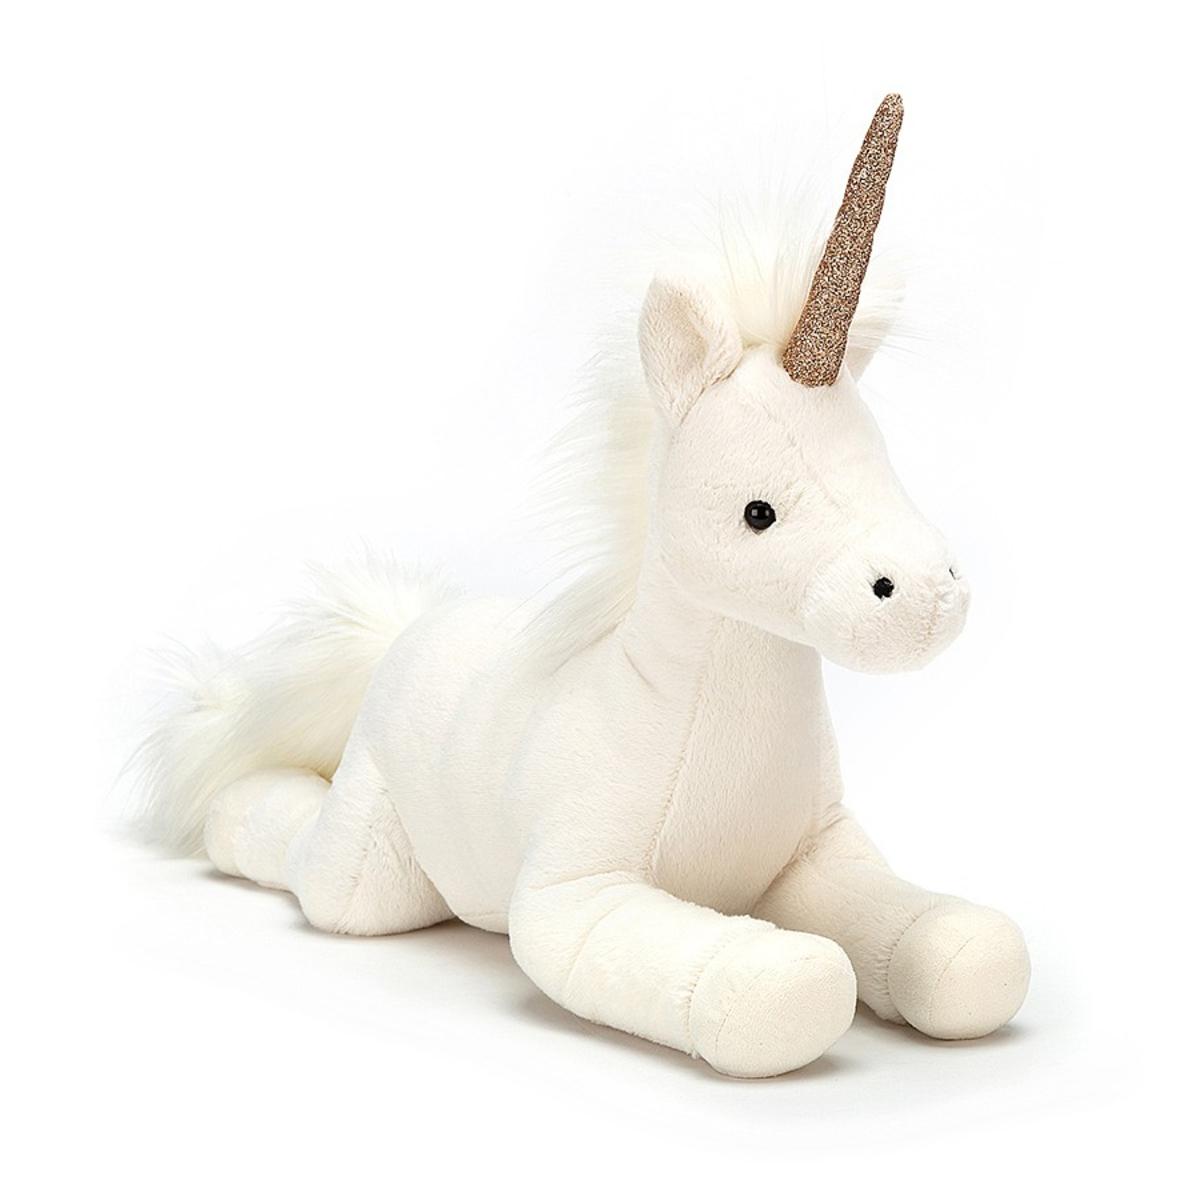 Peluche Luna Unicorn - Large Luna Unicorn - Large